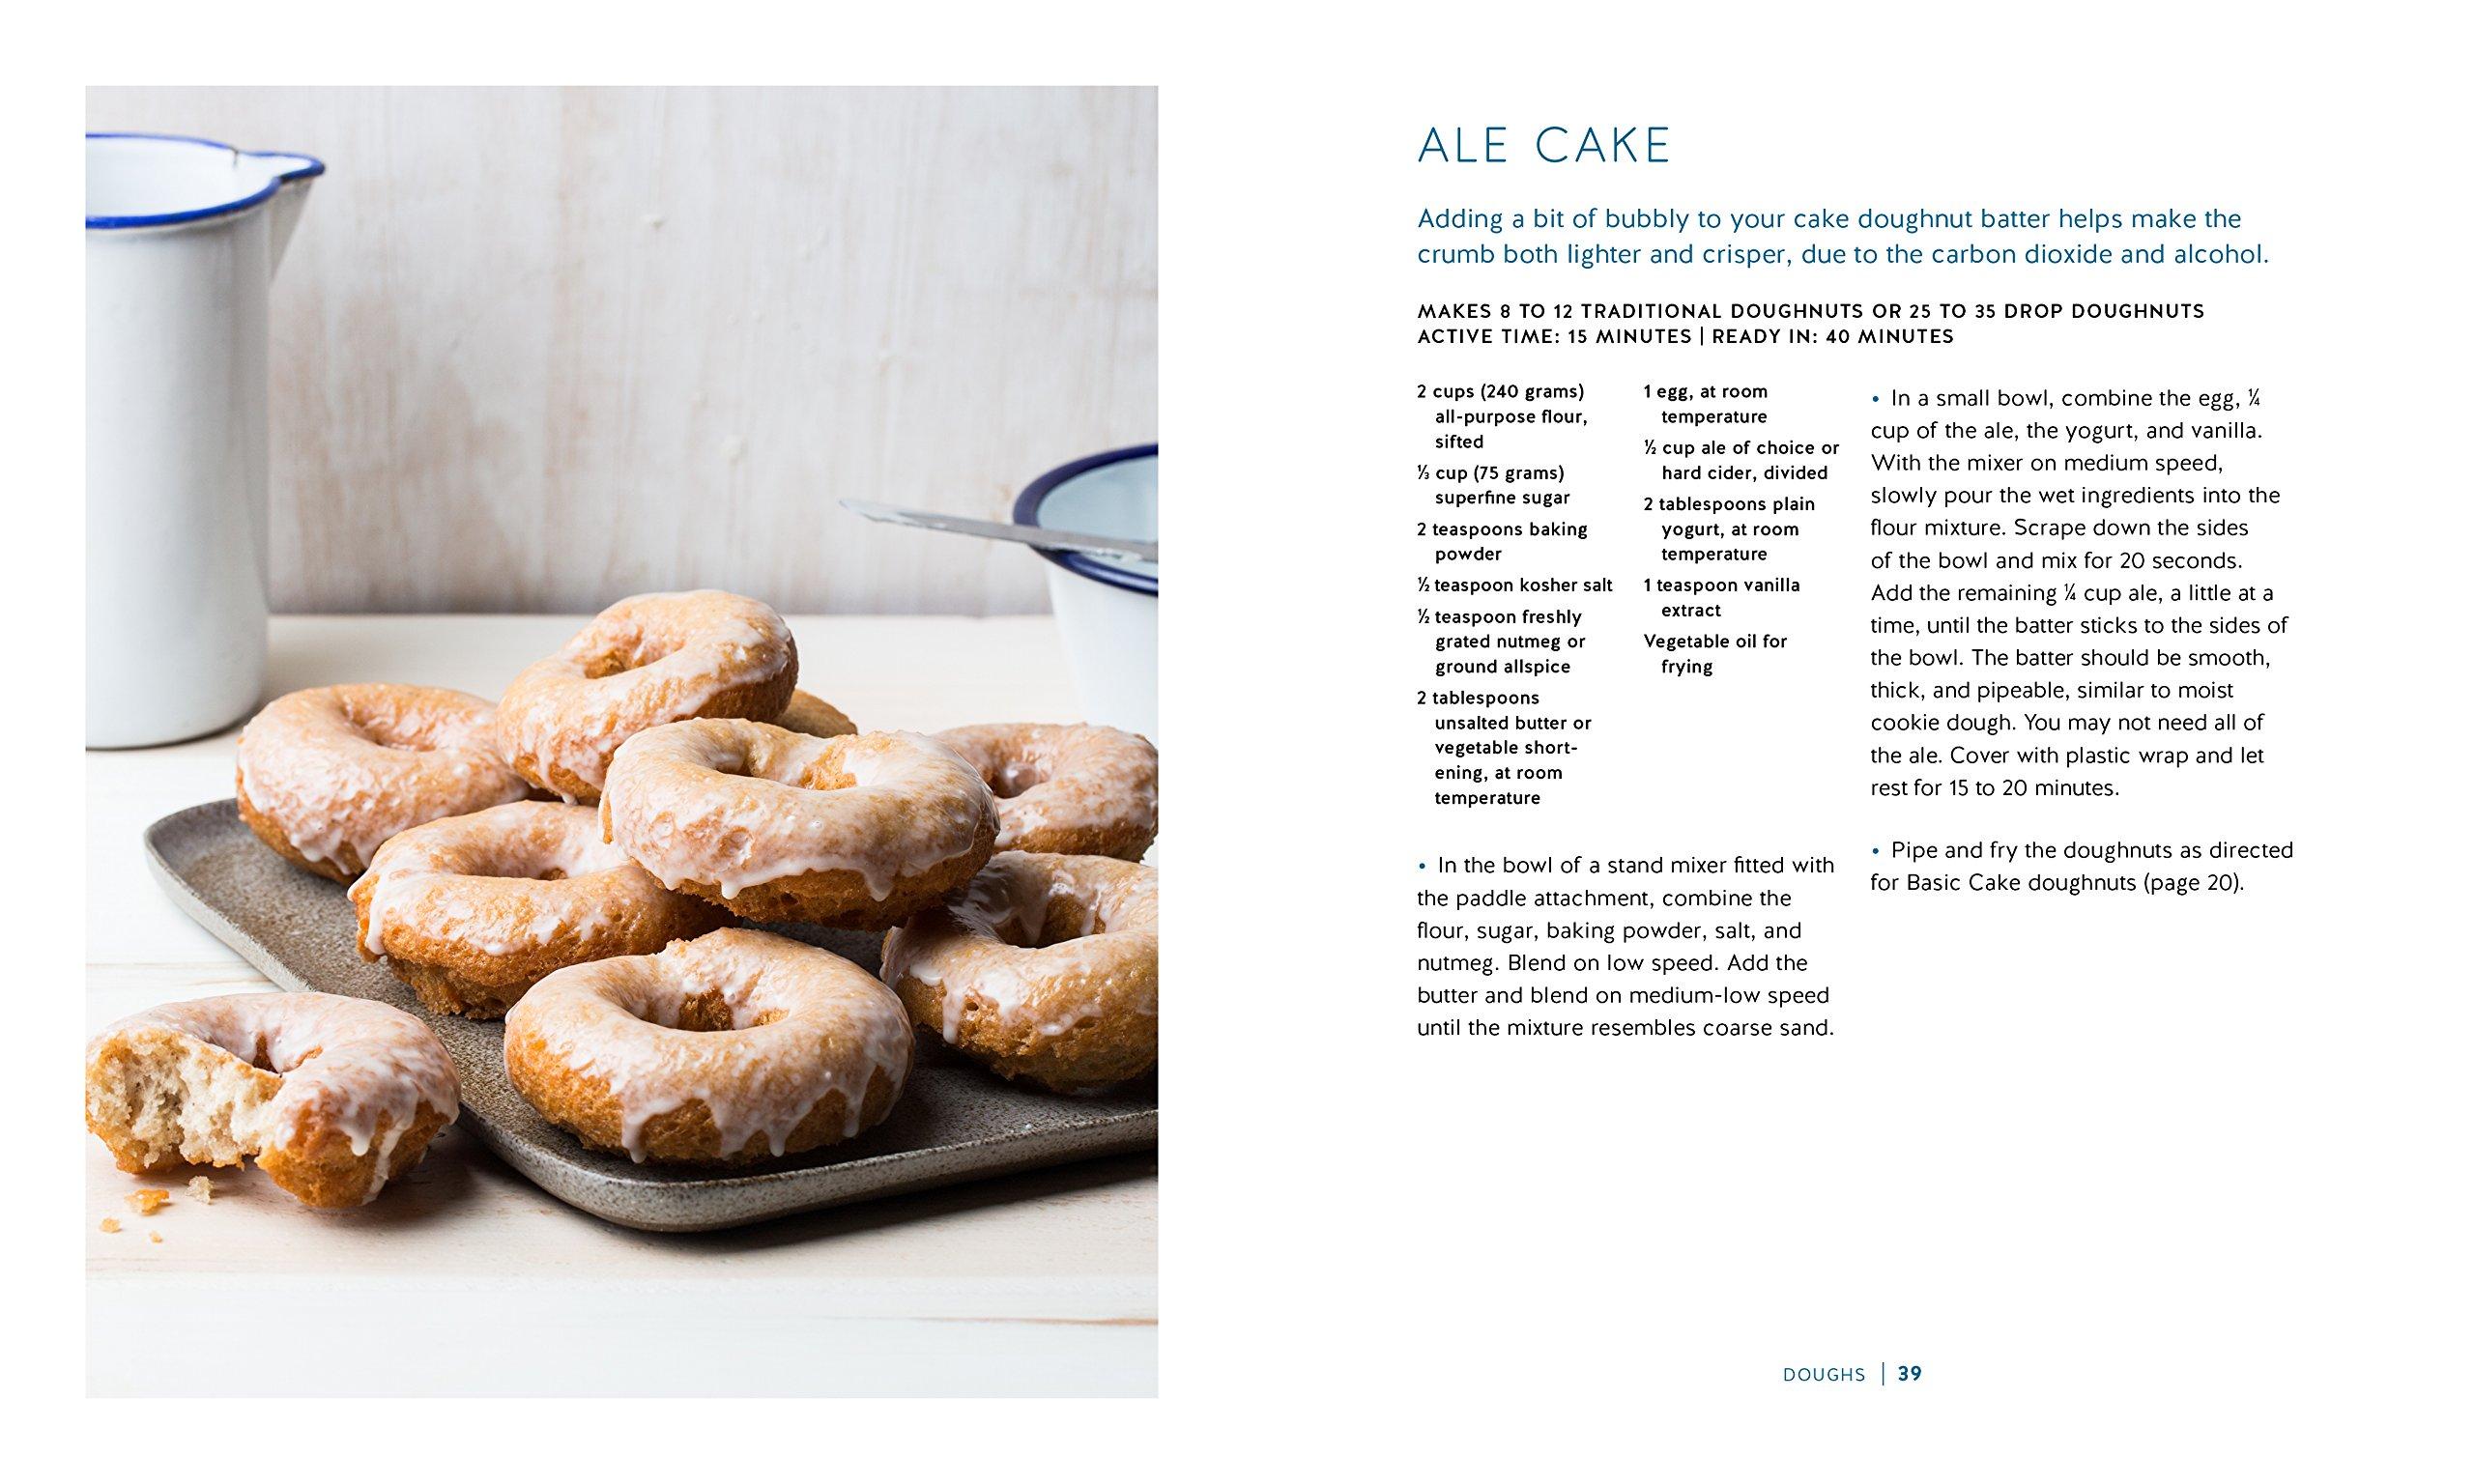 Doughnuts: 90 Simple and Delicious Recipes to Make at Home: Amazon.es: Lara Ferroni: Libros en idiomas extranjeros